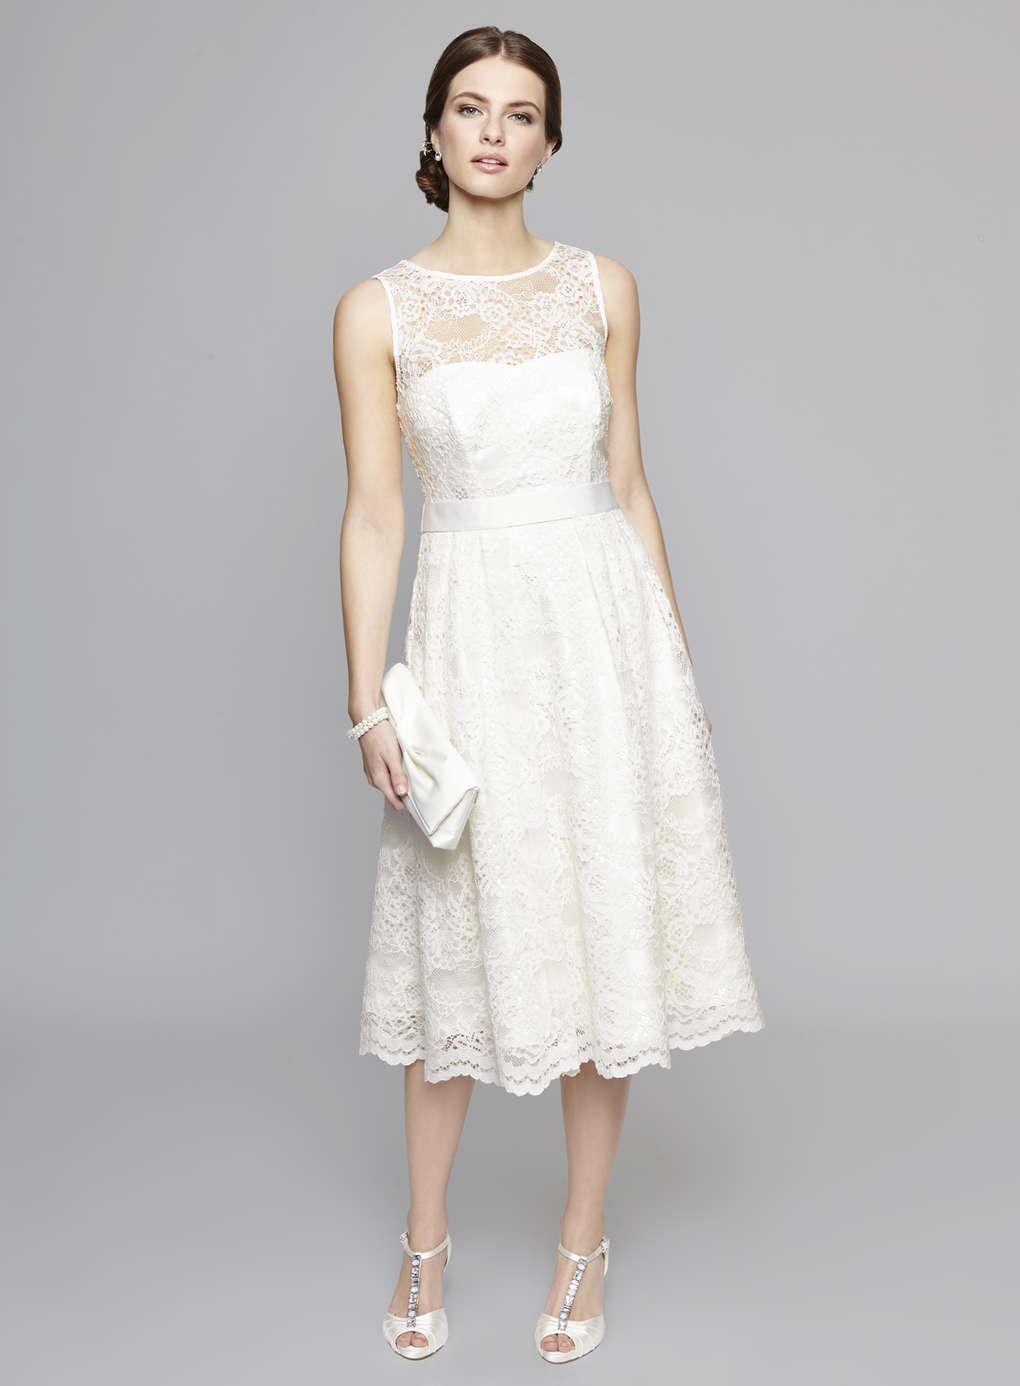 BHS GBP150 Ivory Charlotte Lace Wedding Dress